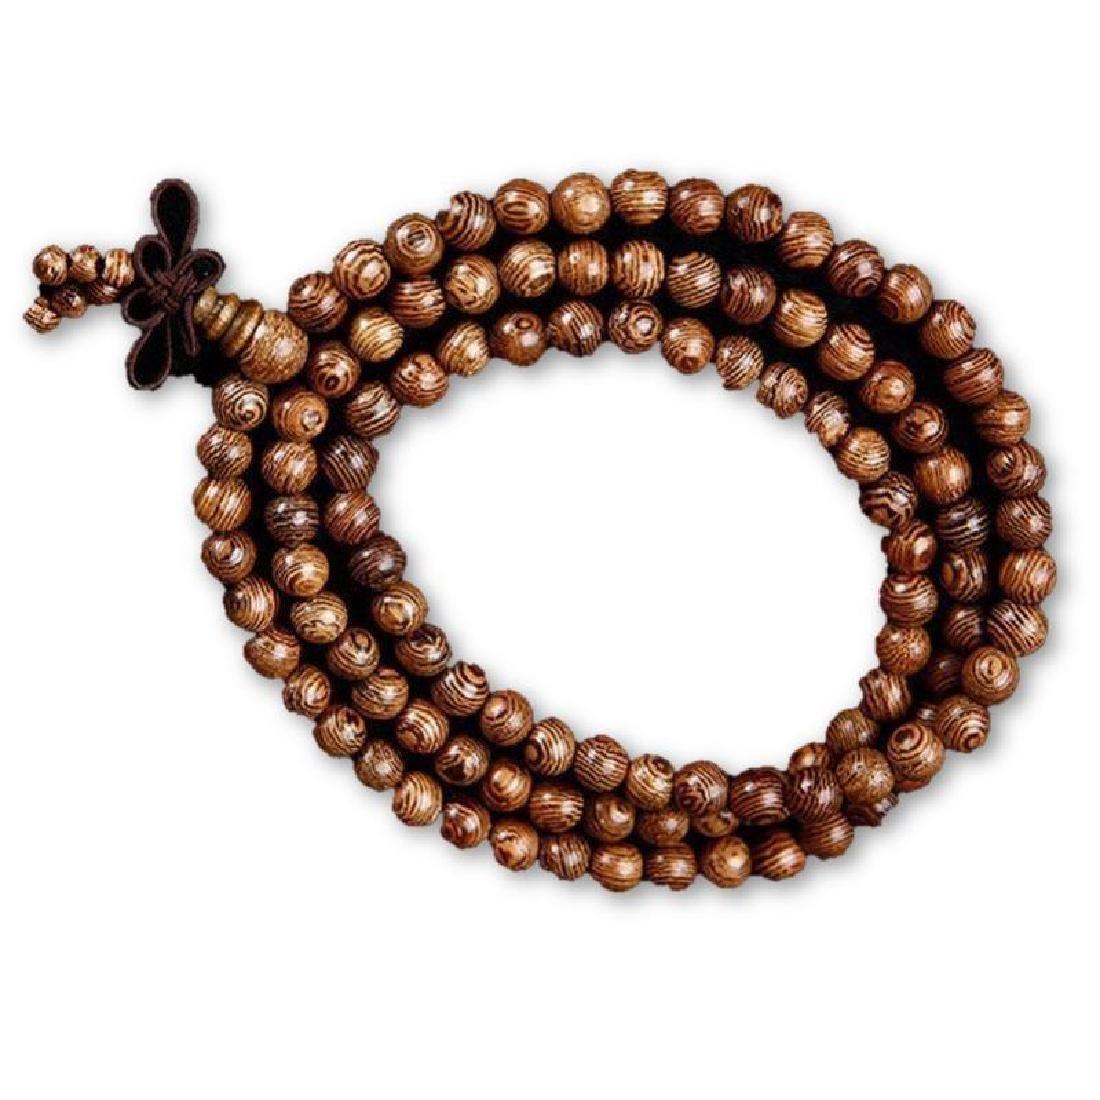 China Tibet Wooden Beads Prayer Mala Bracelet